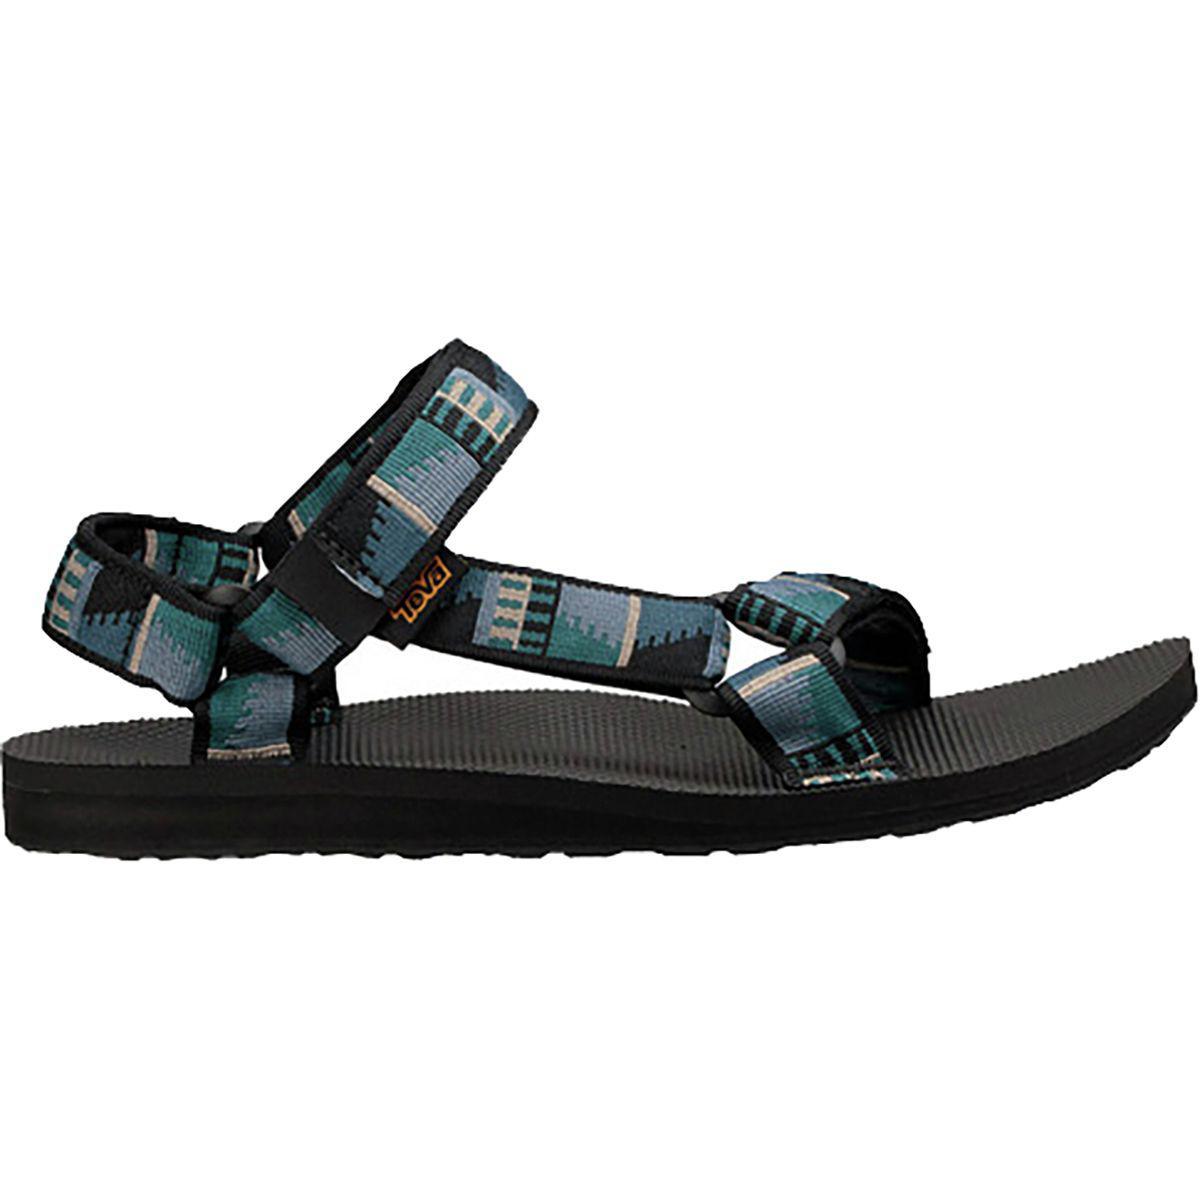 74834a8ea Lyst - Teva Original Universal (boomerang Black white) Men s Sandals ...